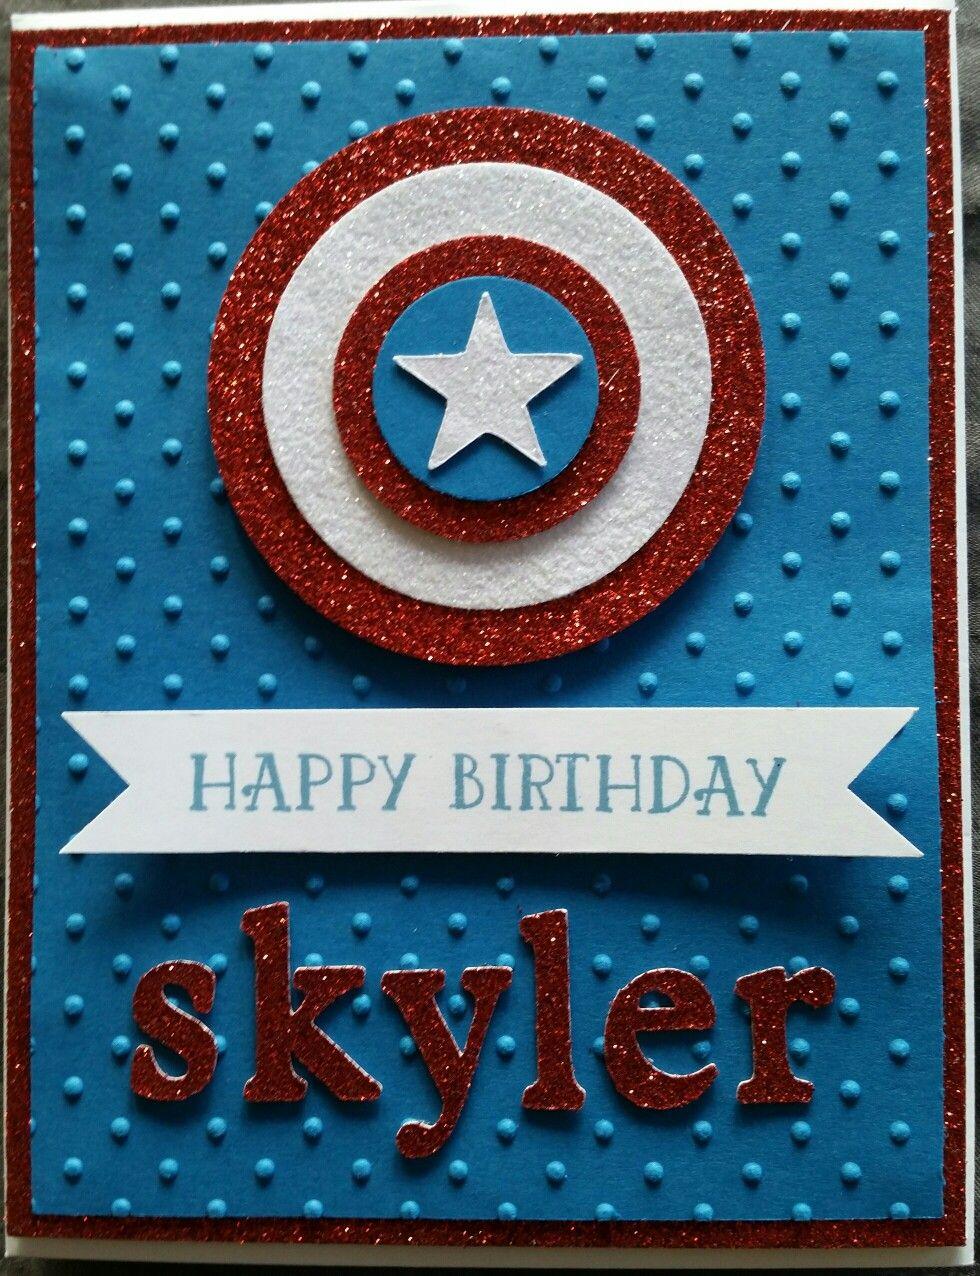 Captain America Birthday Card Birthday Cards For Men Cricut Birthday Cards Birthday Cards For Boys